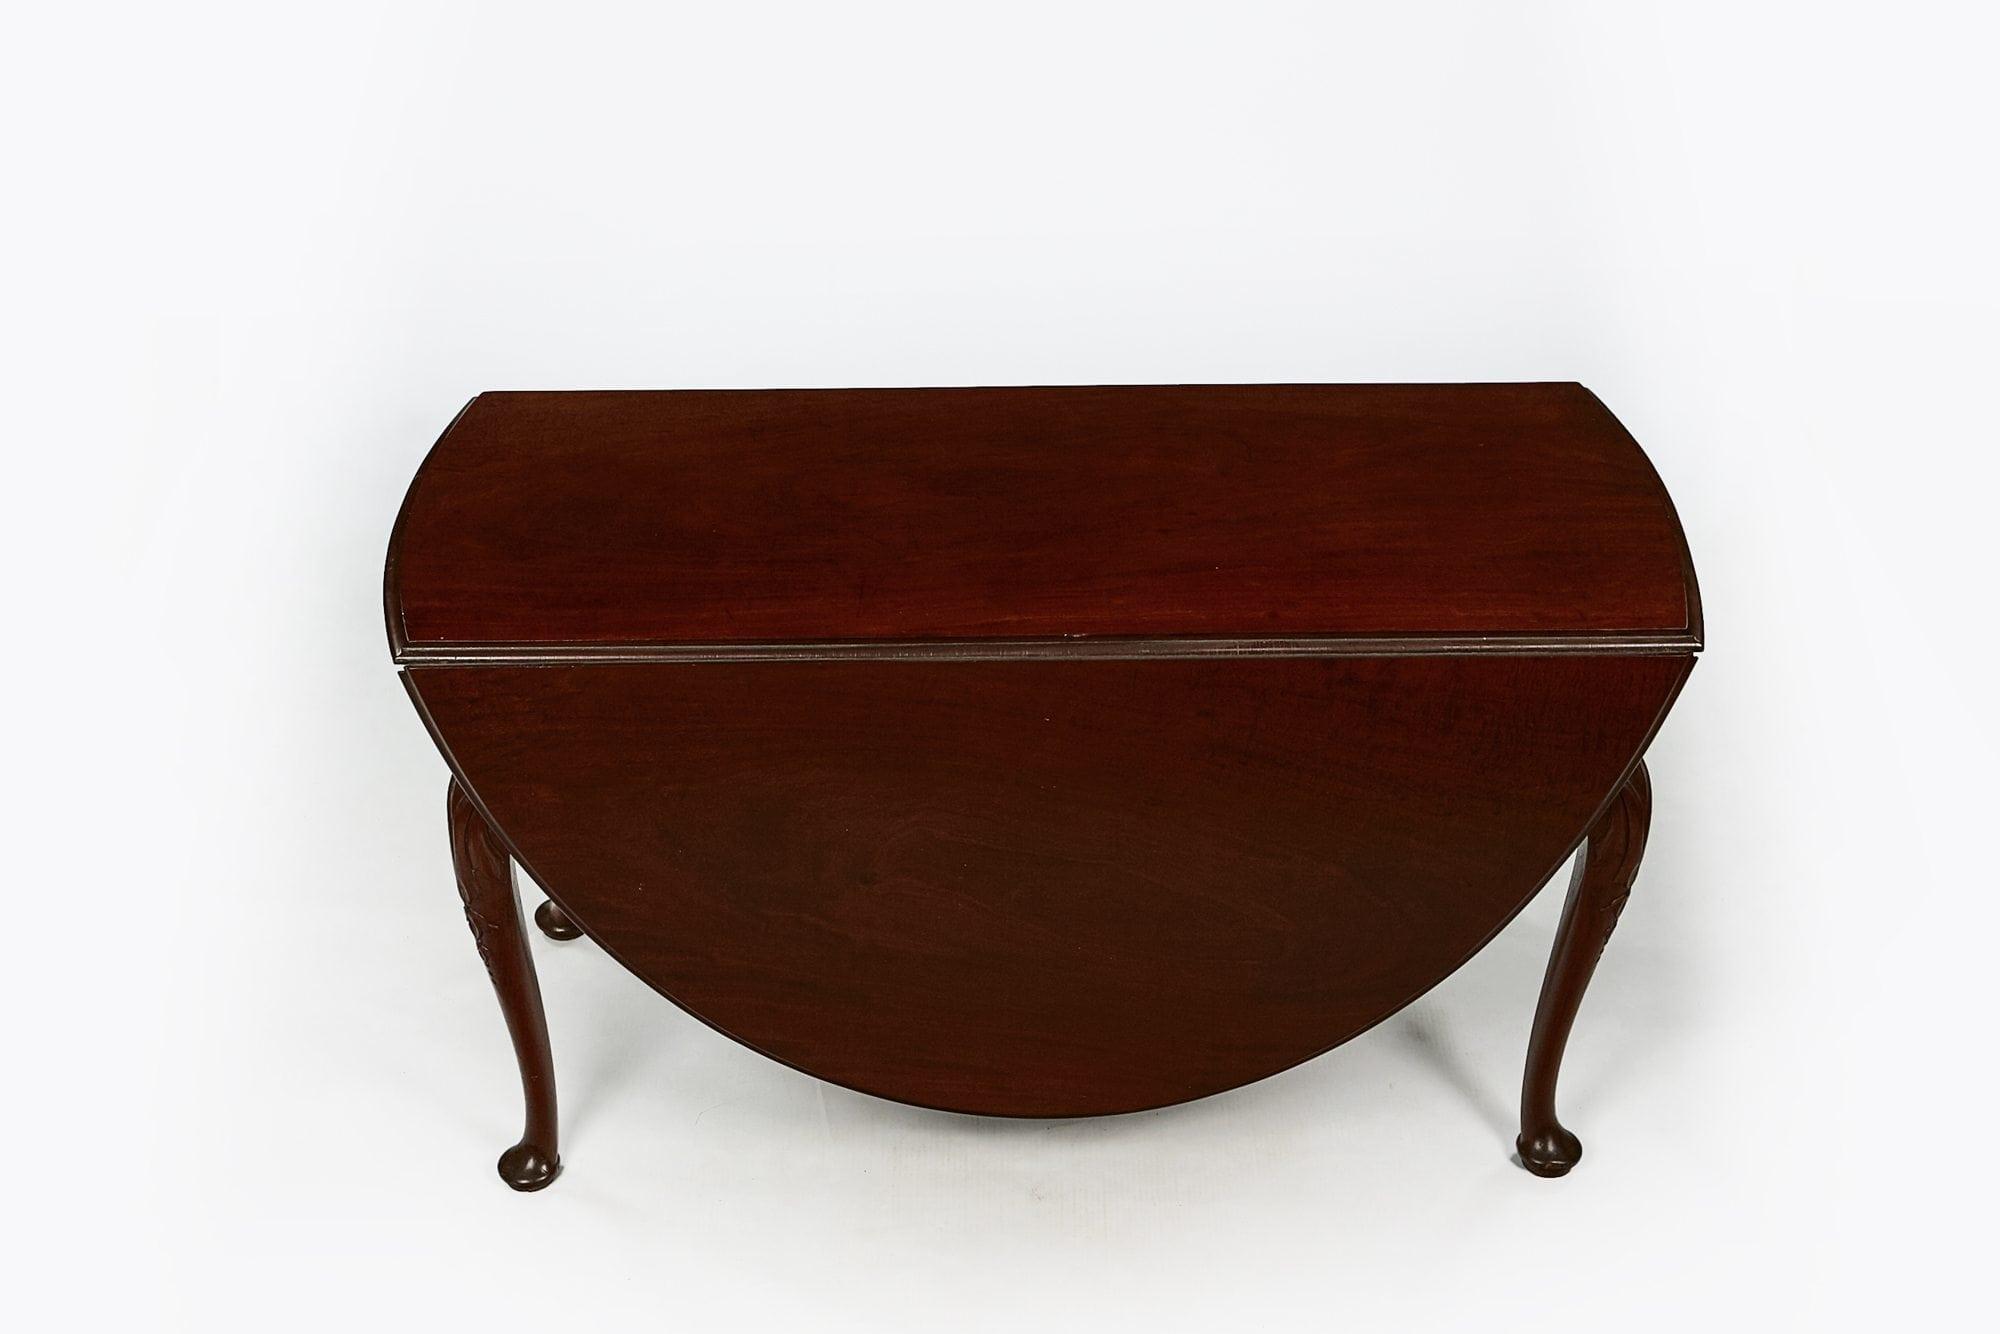 10150 Early 19th Century George Iii Flame Mahogany Drop Leaf Table